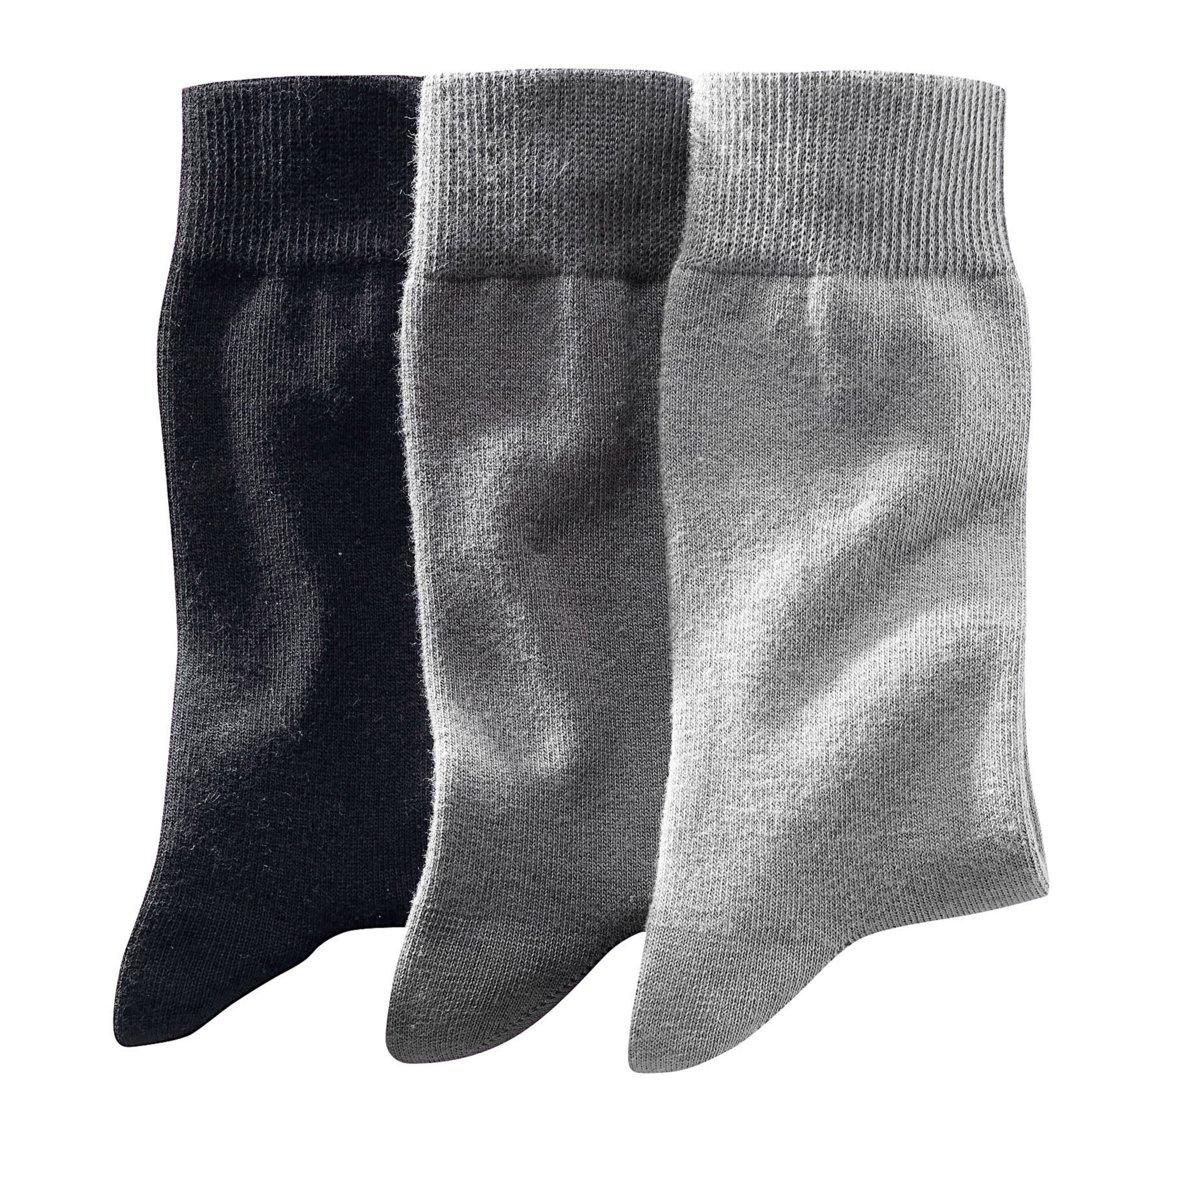 3 пары носков от La Redoute